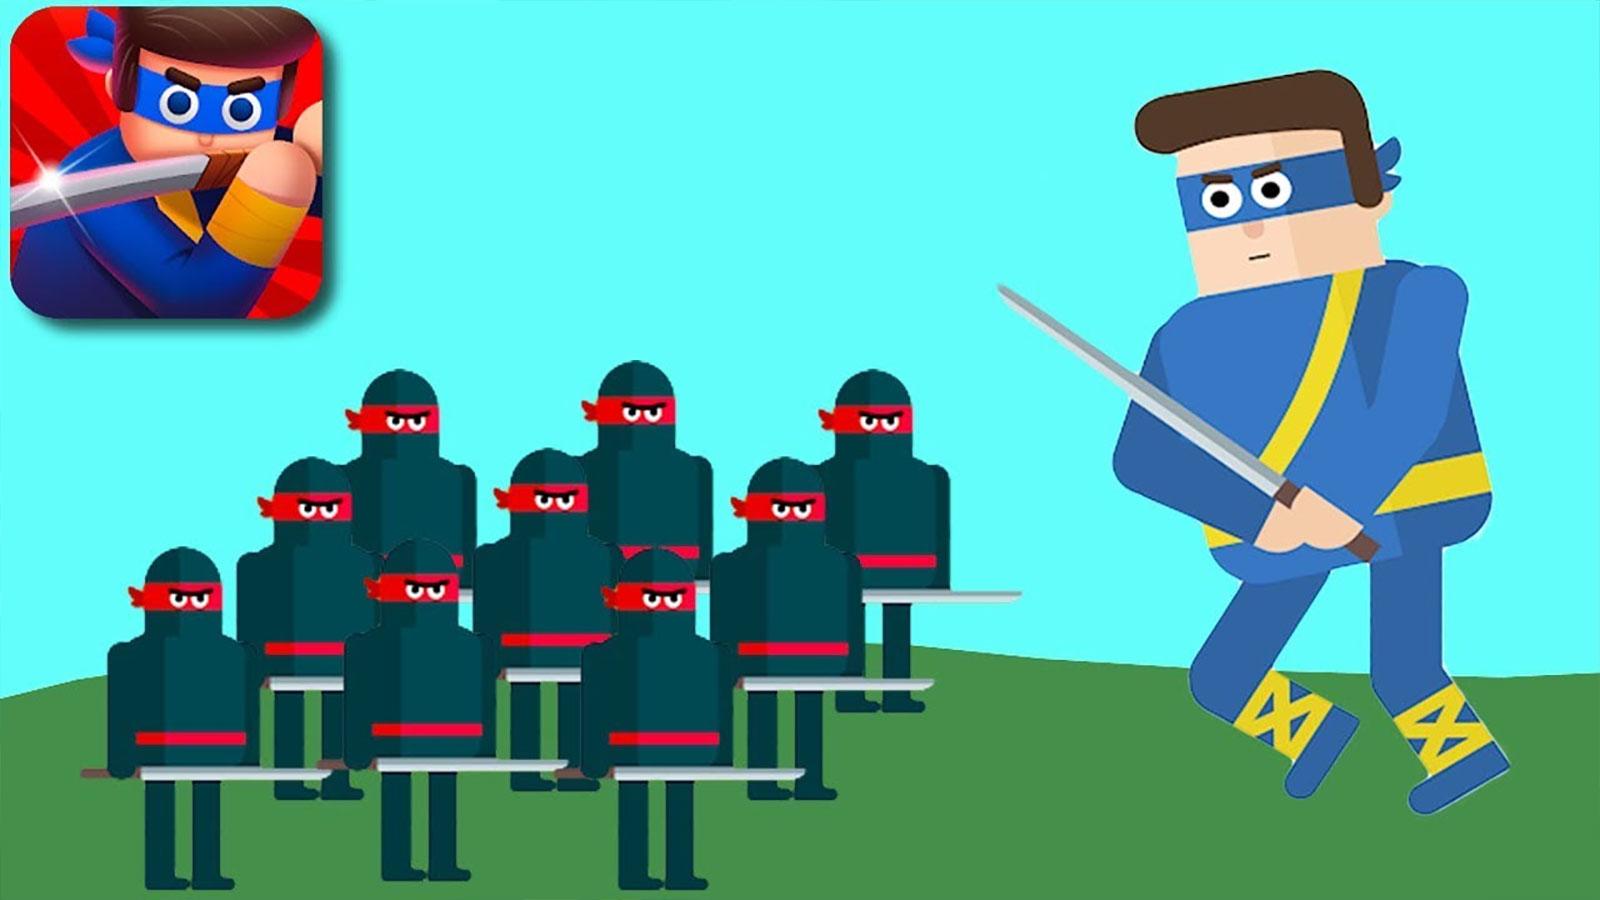 Mr Ninja - Slicey Puzzles Mod Apk